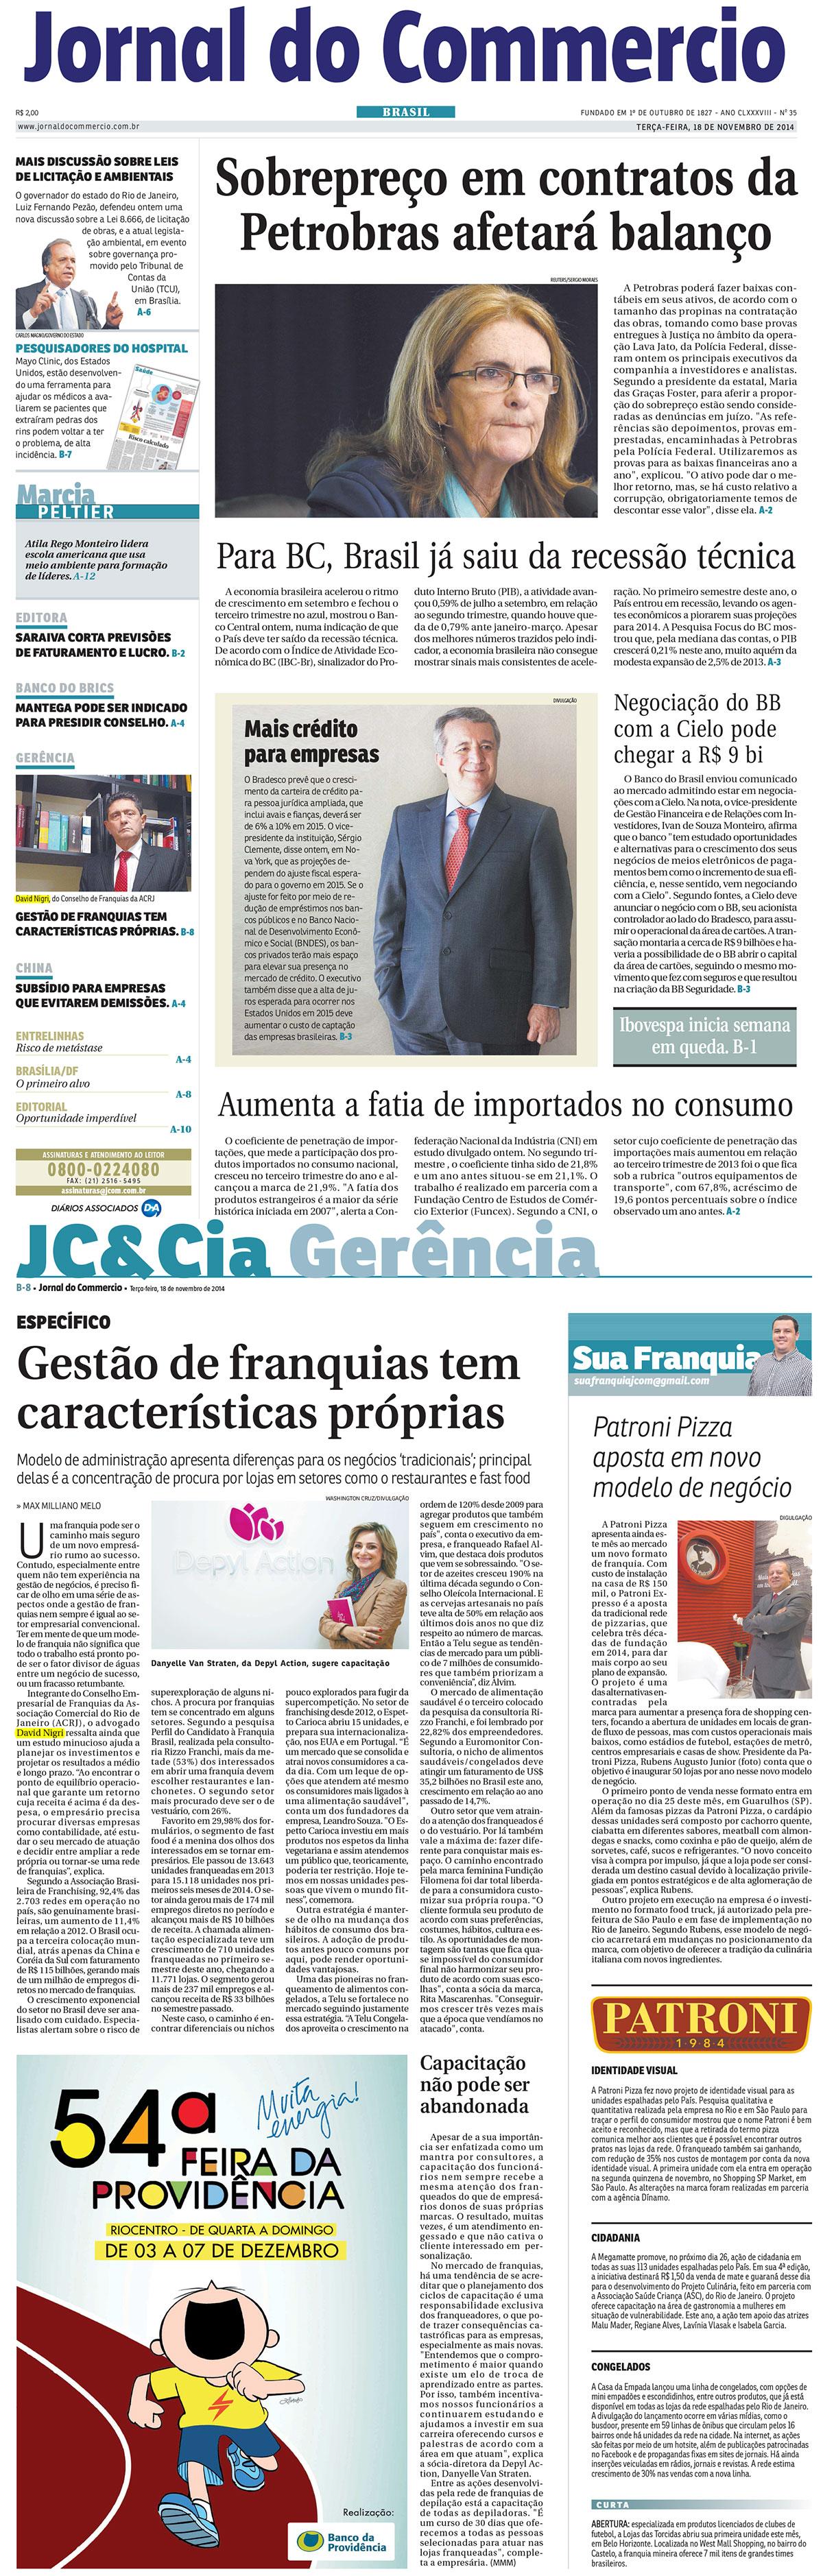 Jornal-do-Commercio-18-11-2014-1